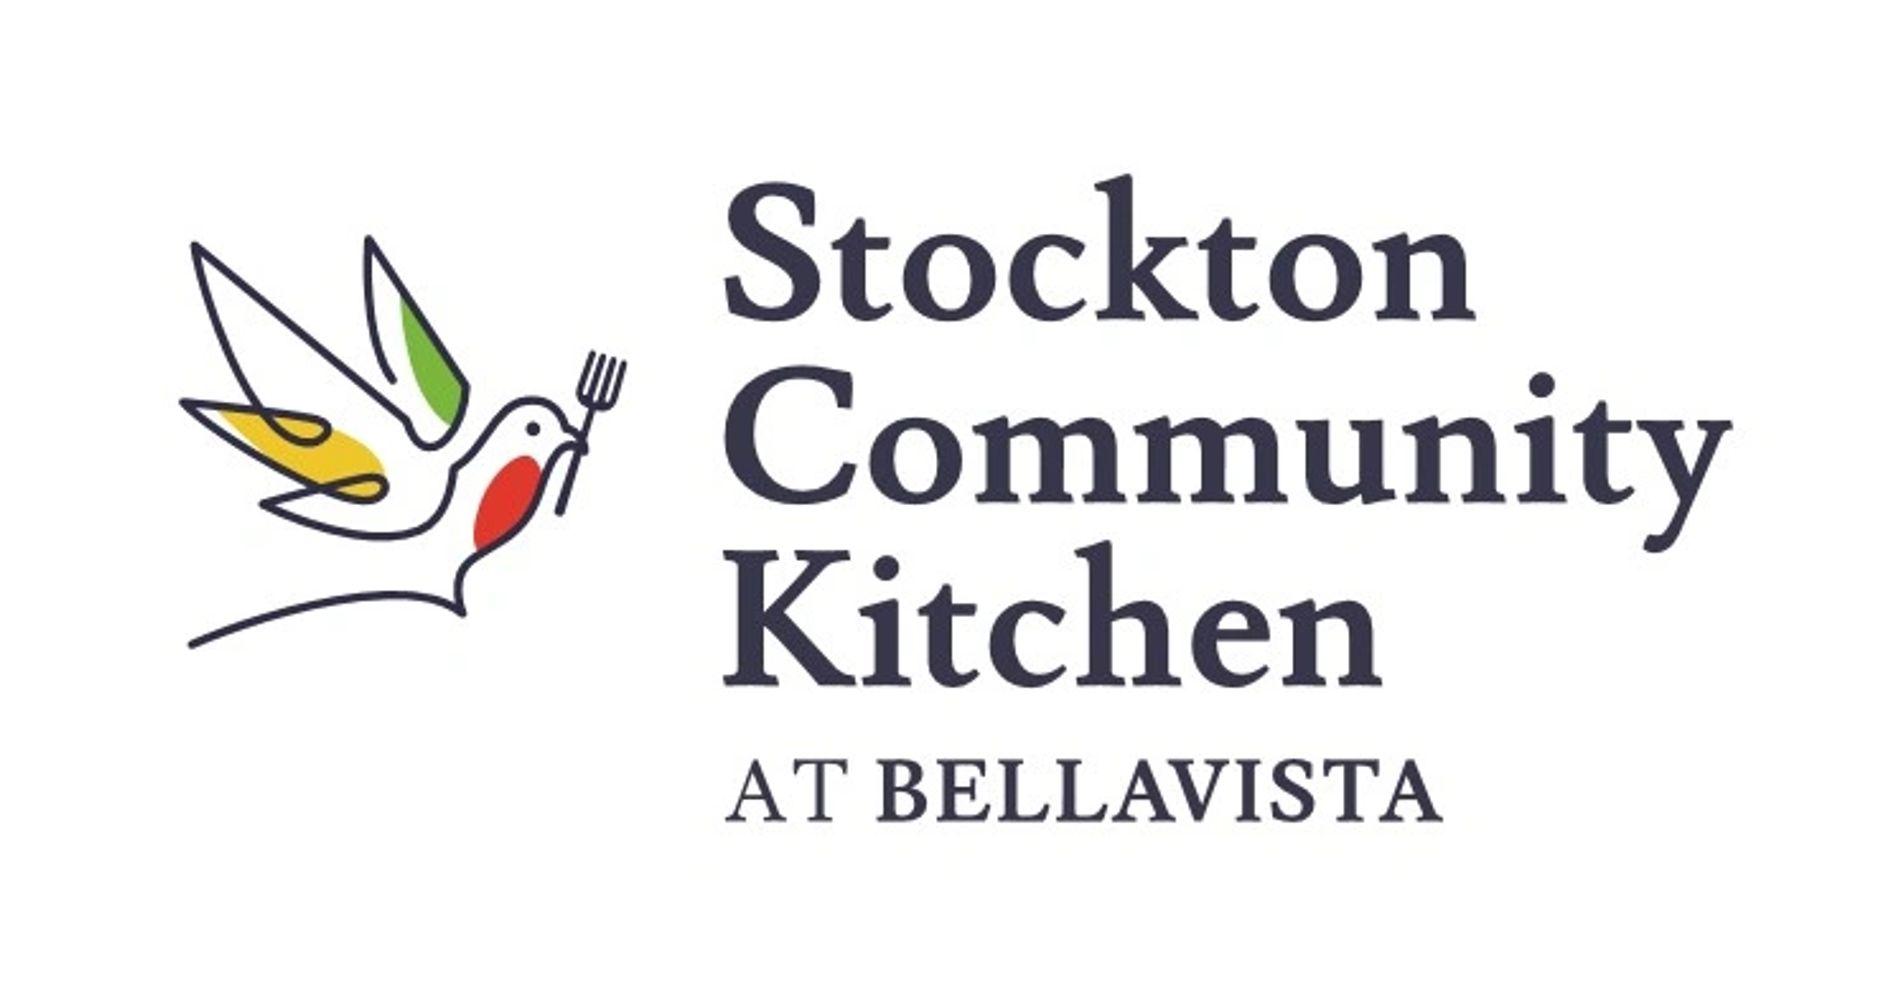 Stockton Community Kitchen